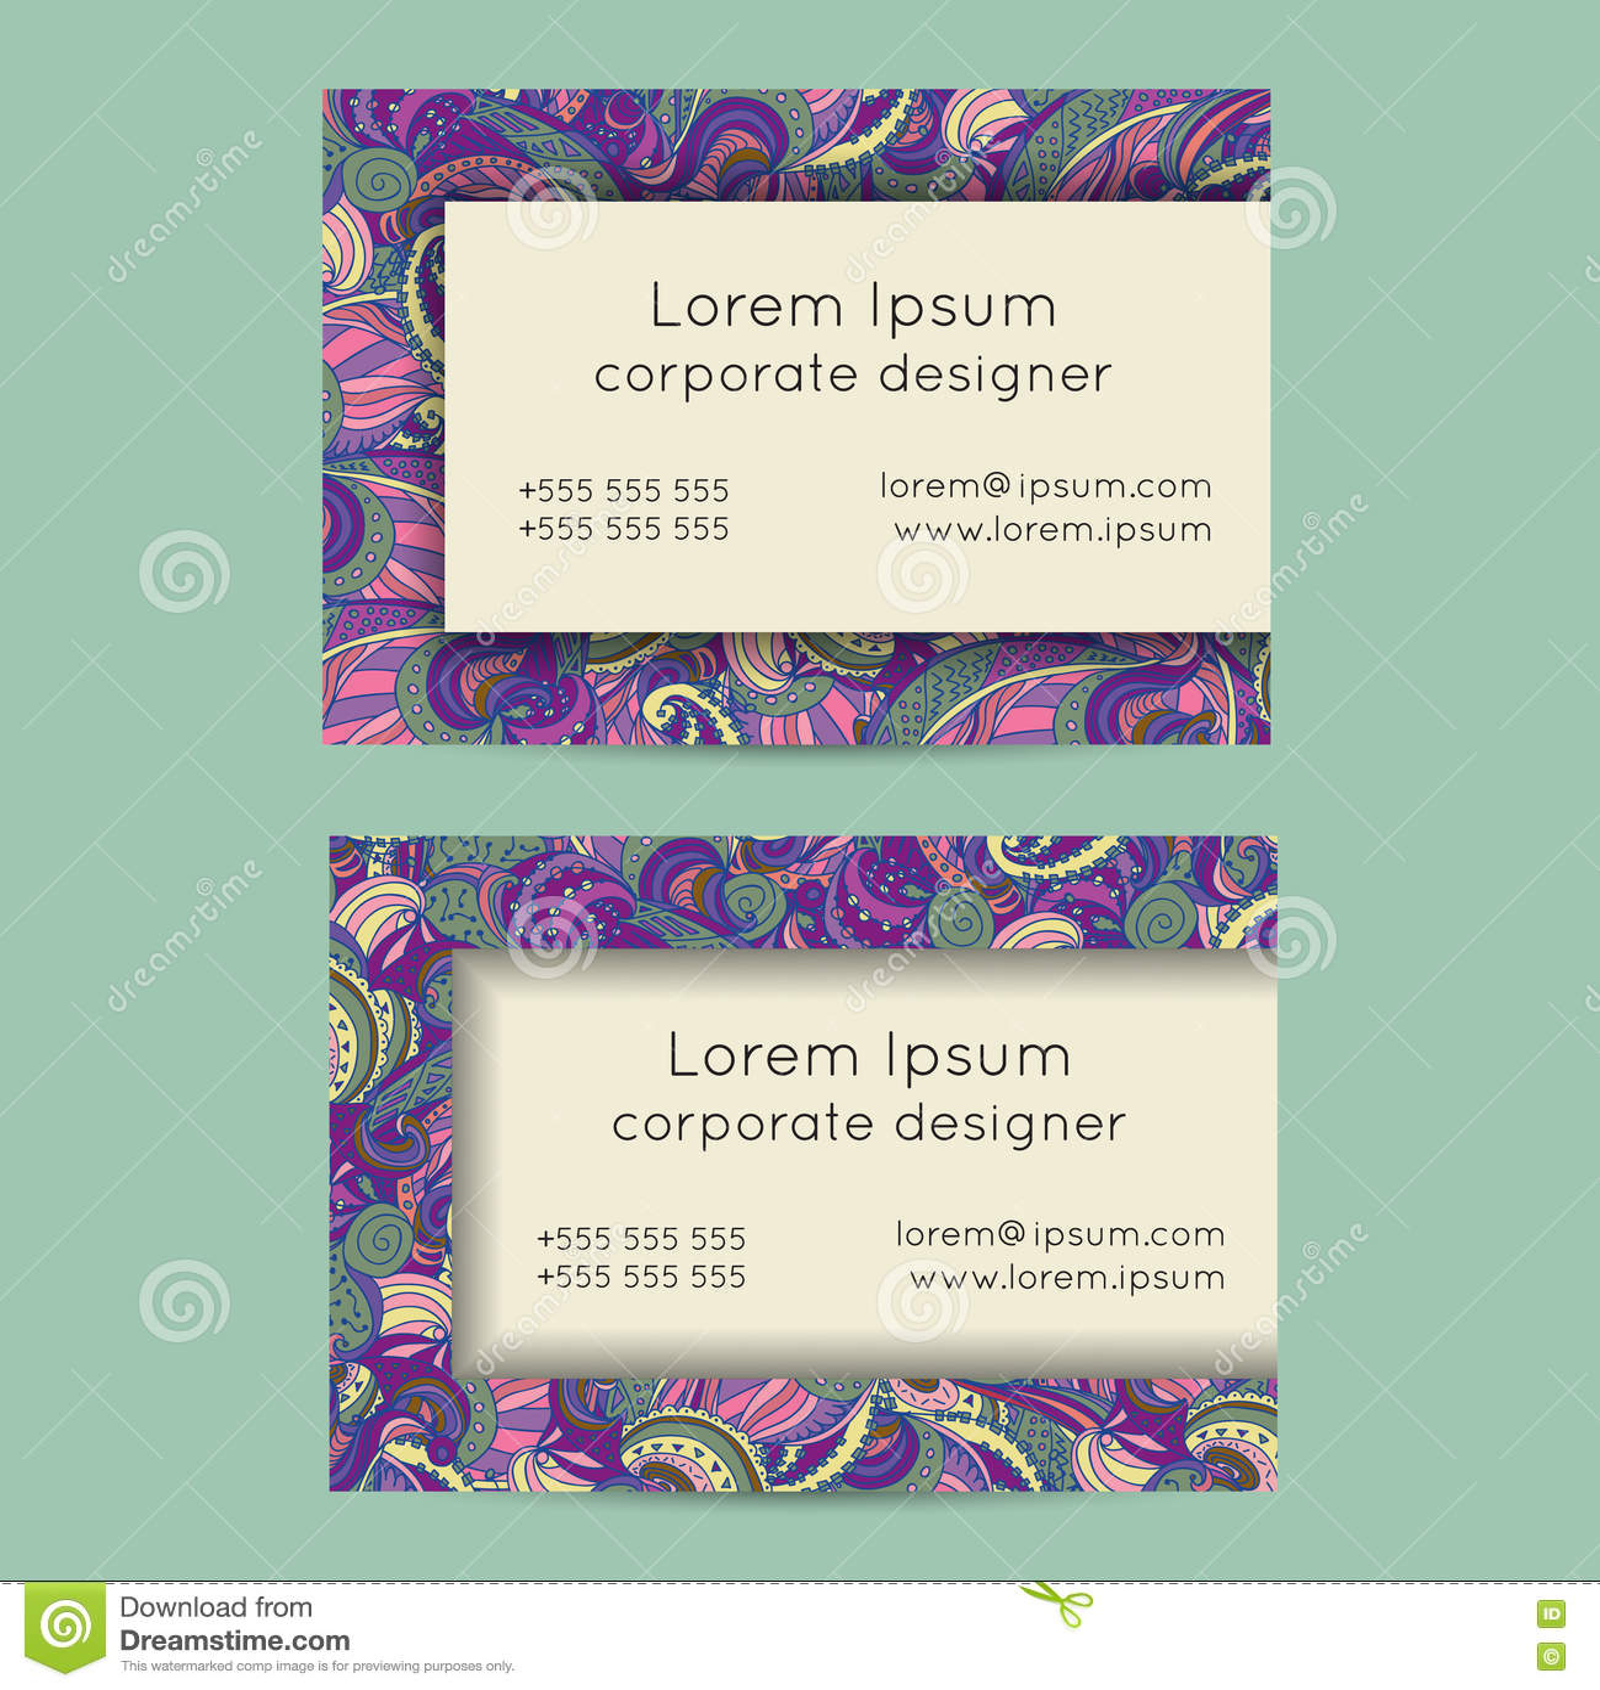 Boho paisley business cards templates stock vector image 70015577 boho business card doodle drawn feminine hand paisley magicingreecefo Images